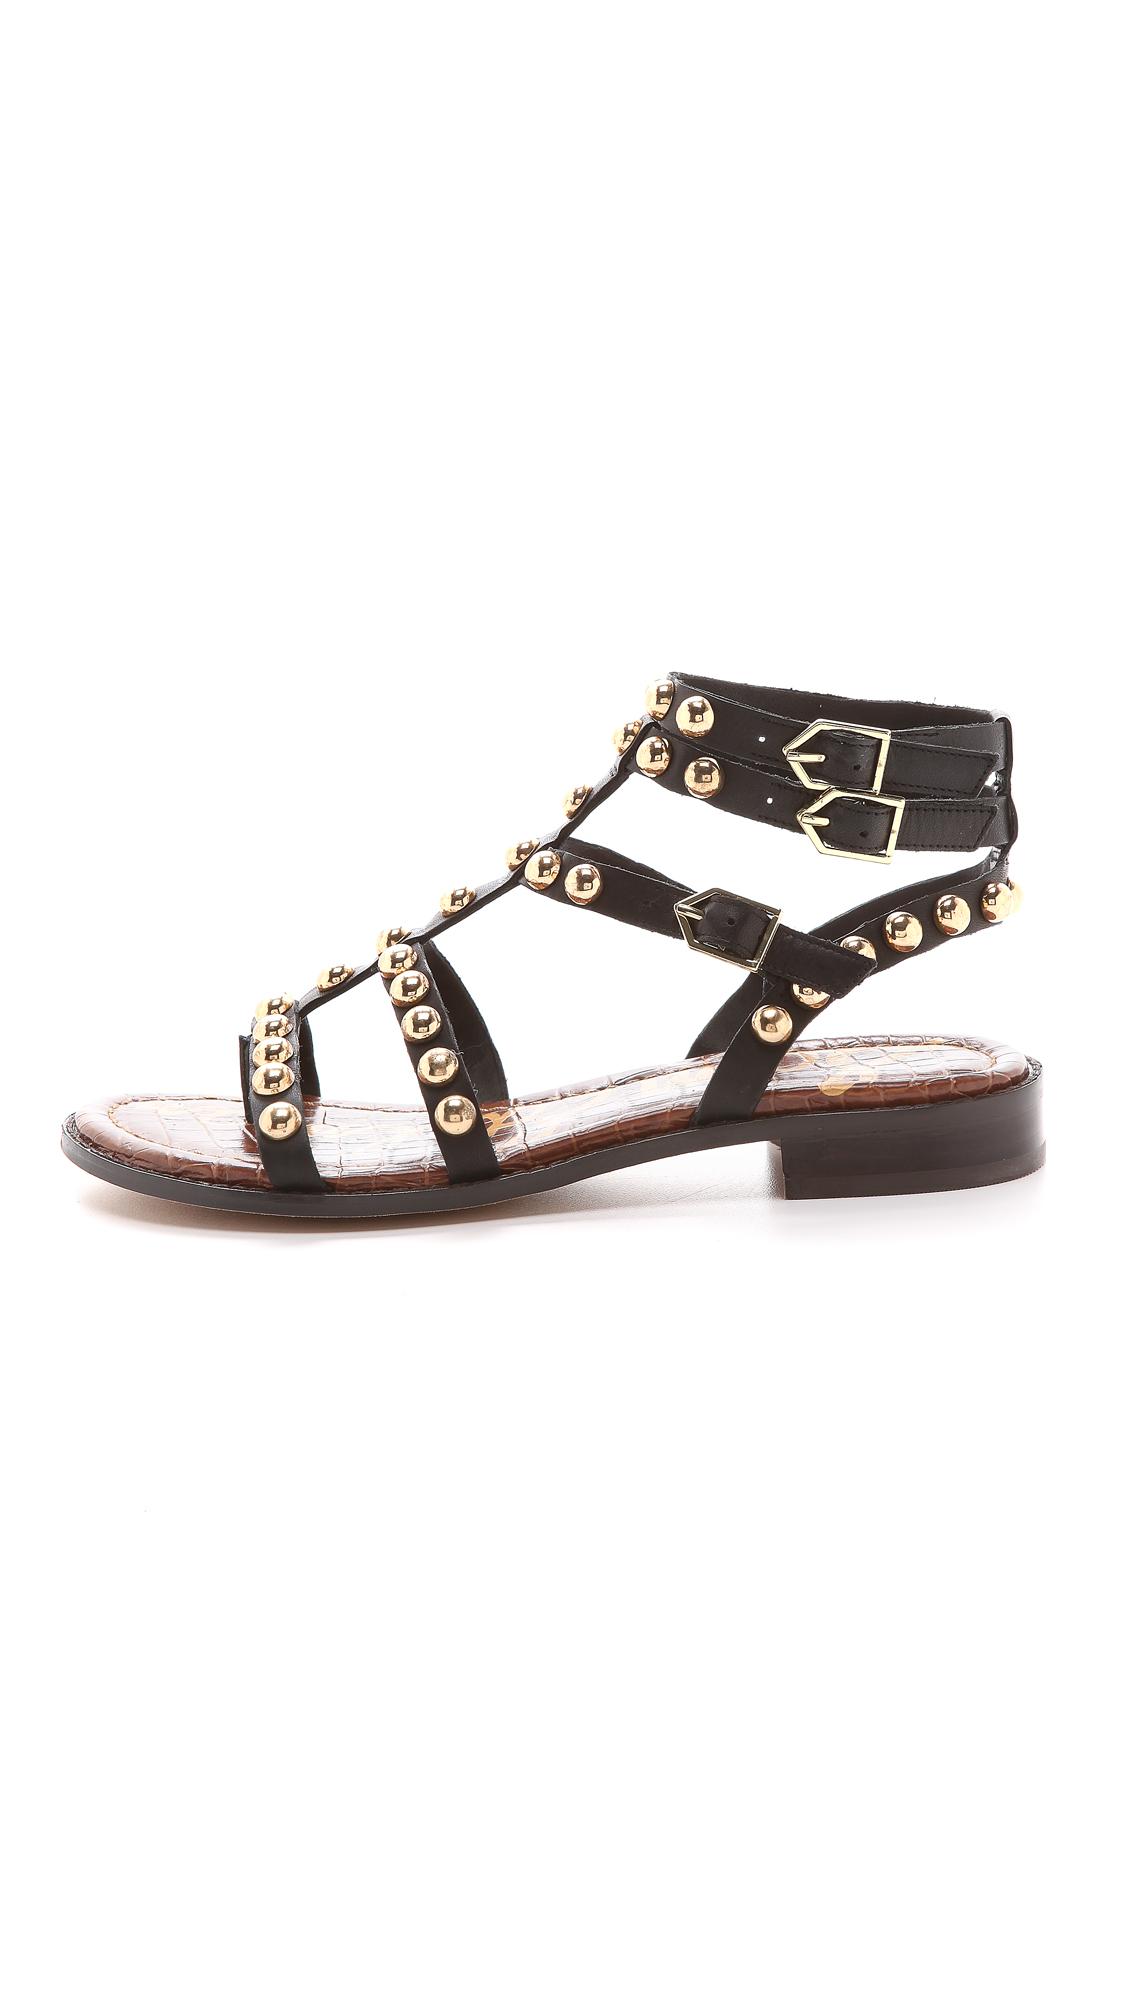 4a17bbaff51f Sam Edelman Eavan Studded Gladiator Sandals